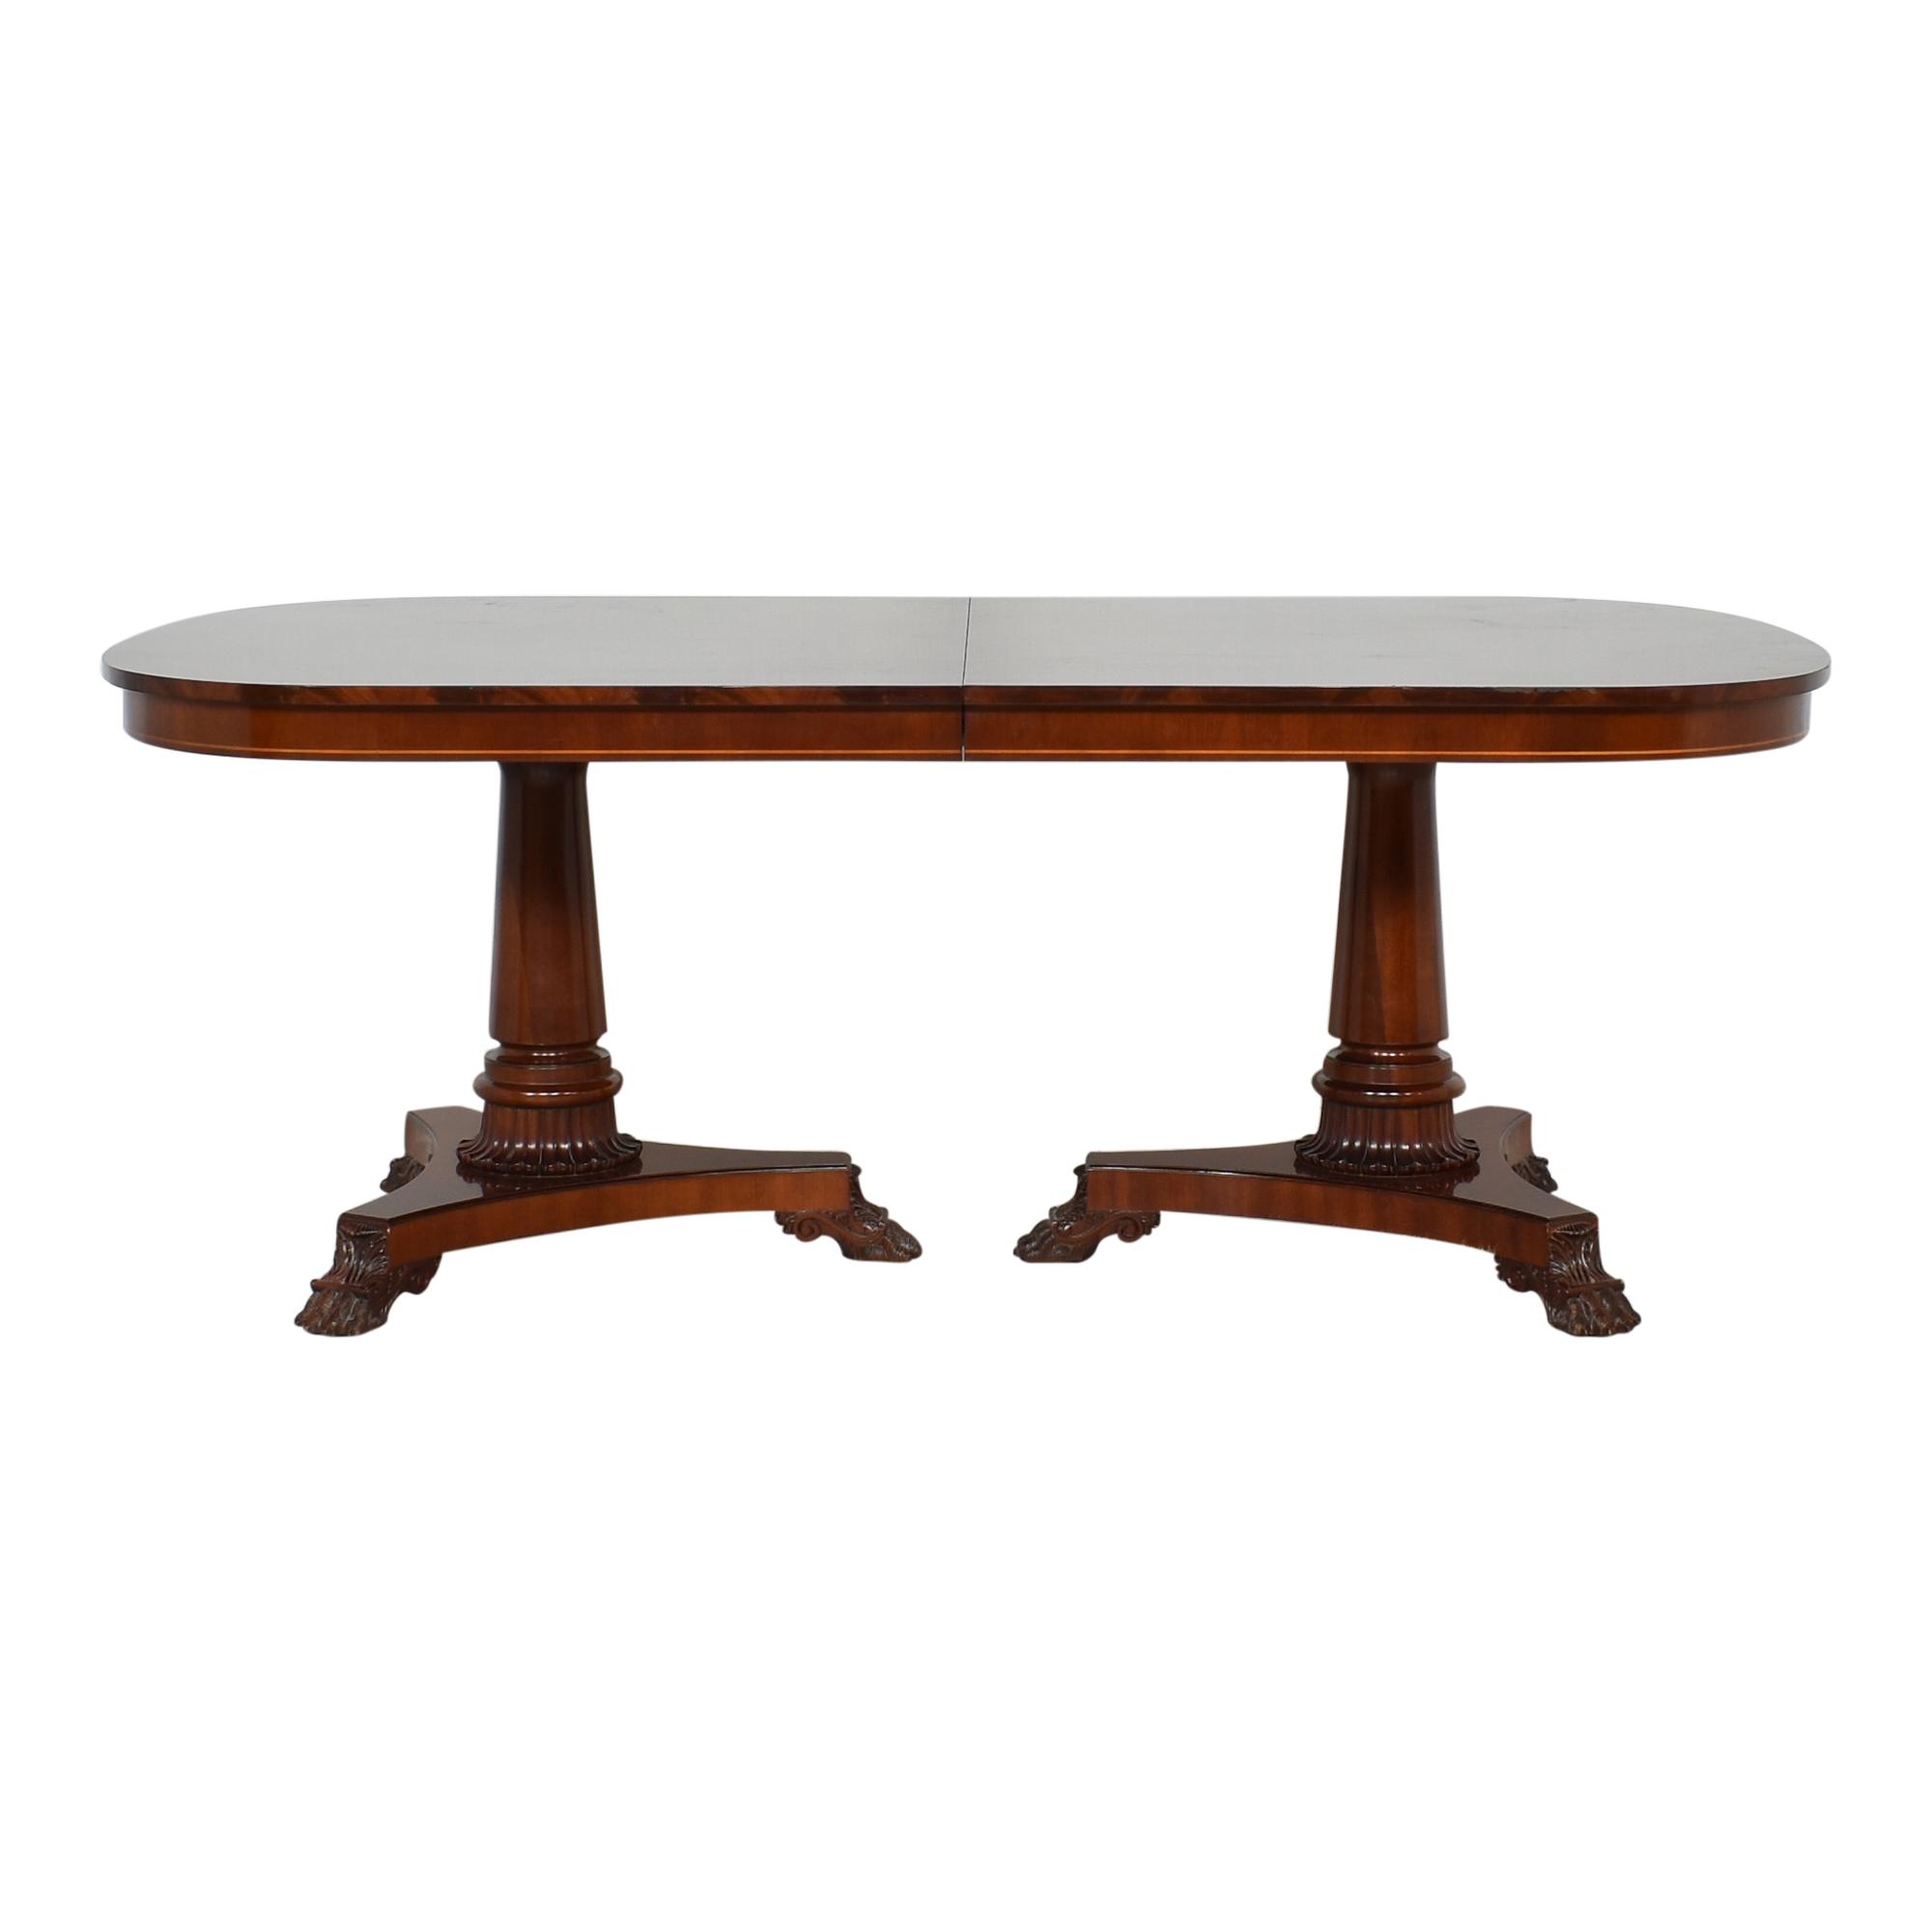 Kindel Kindel Extendable Double Pedestal Dining Table ma